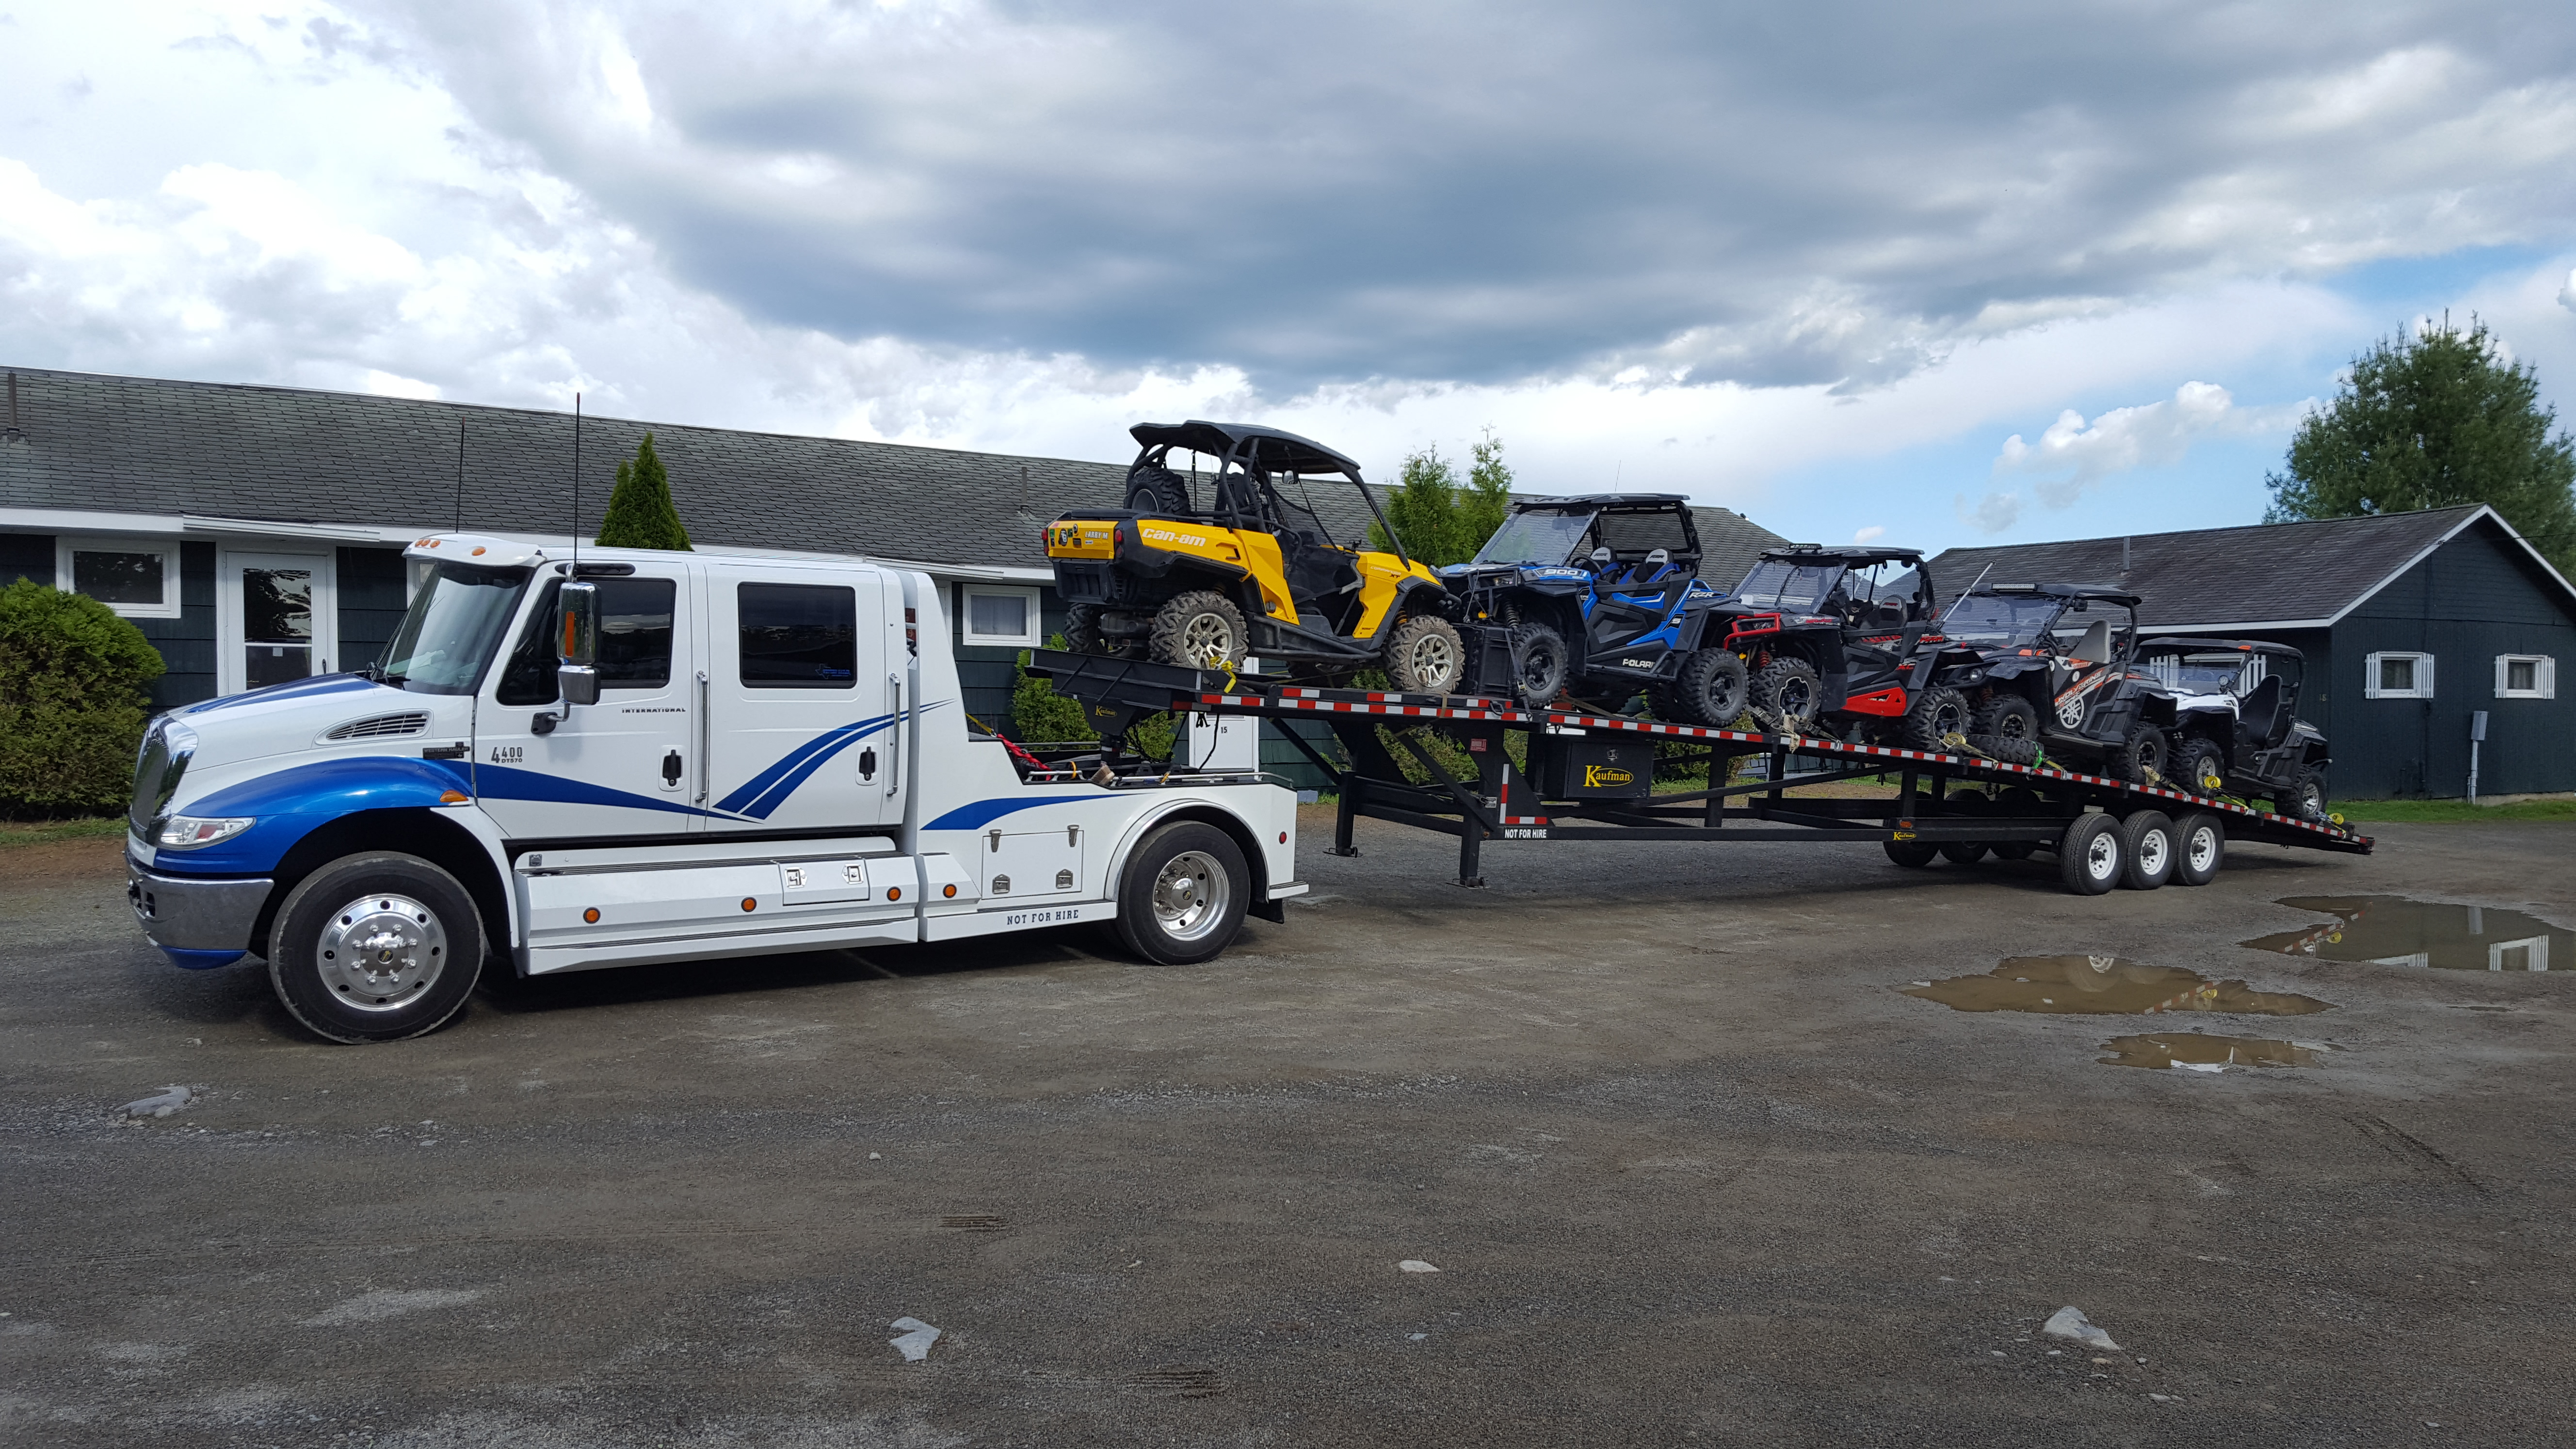 Name:  truck trailer.jpg Views: 57 Size:  4.25 MB